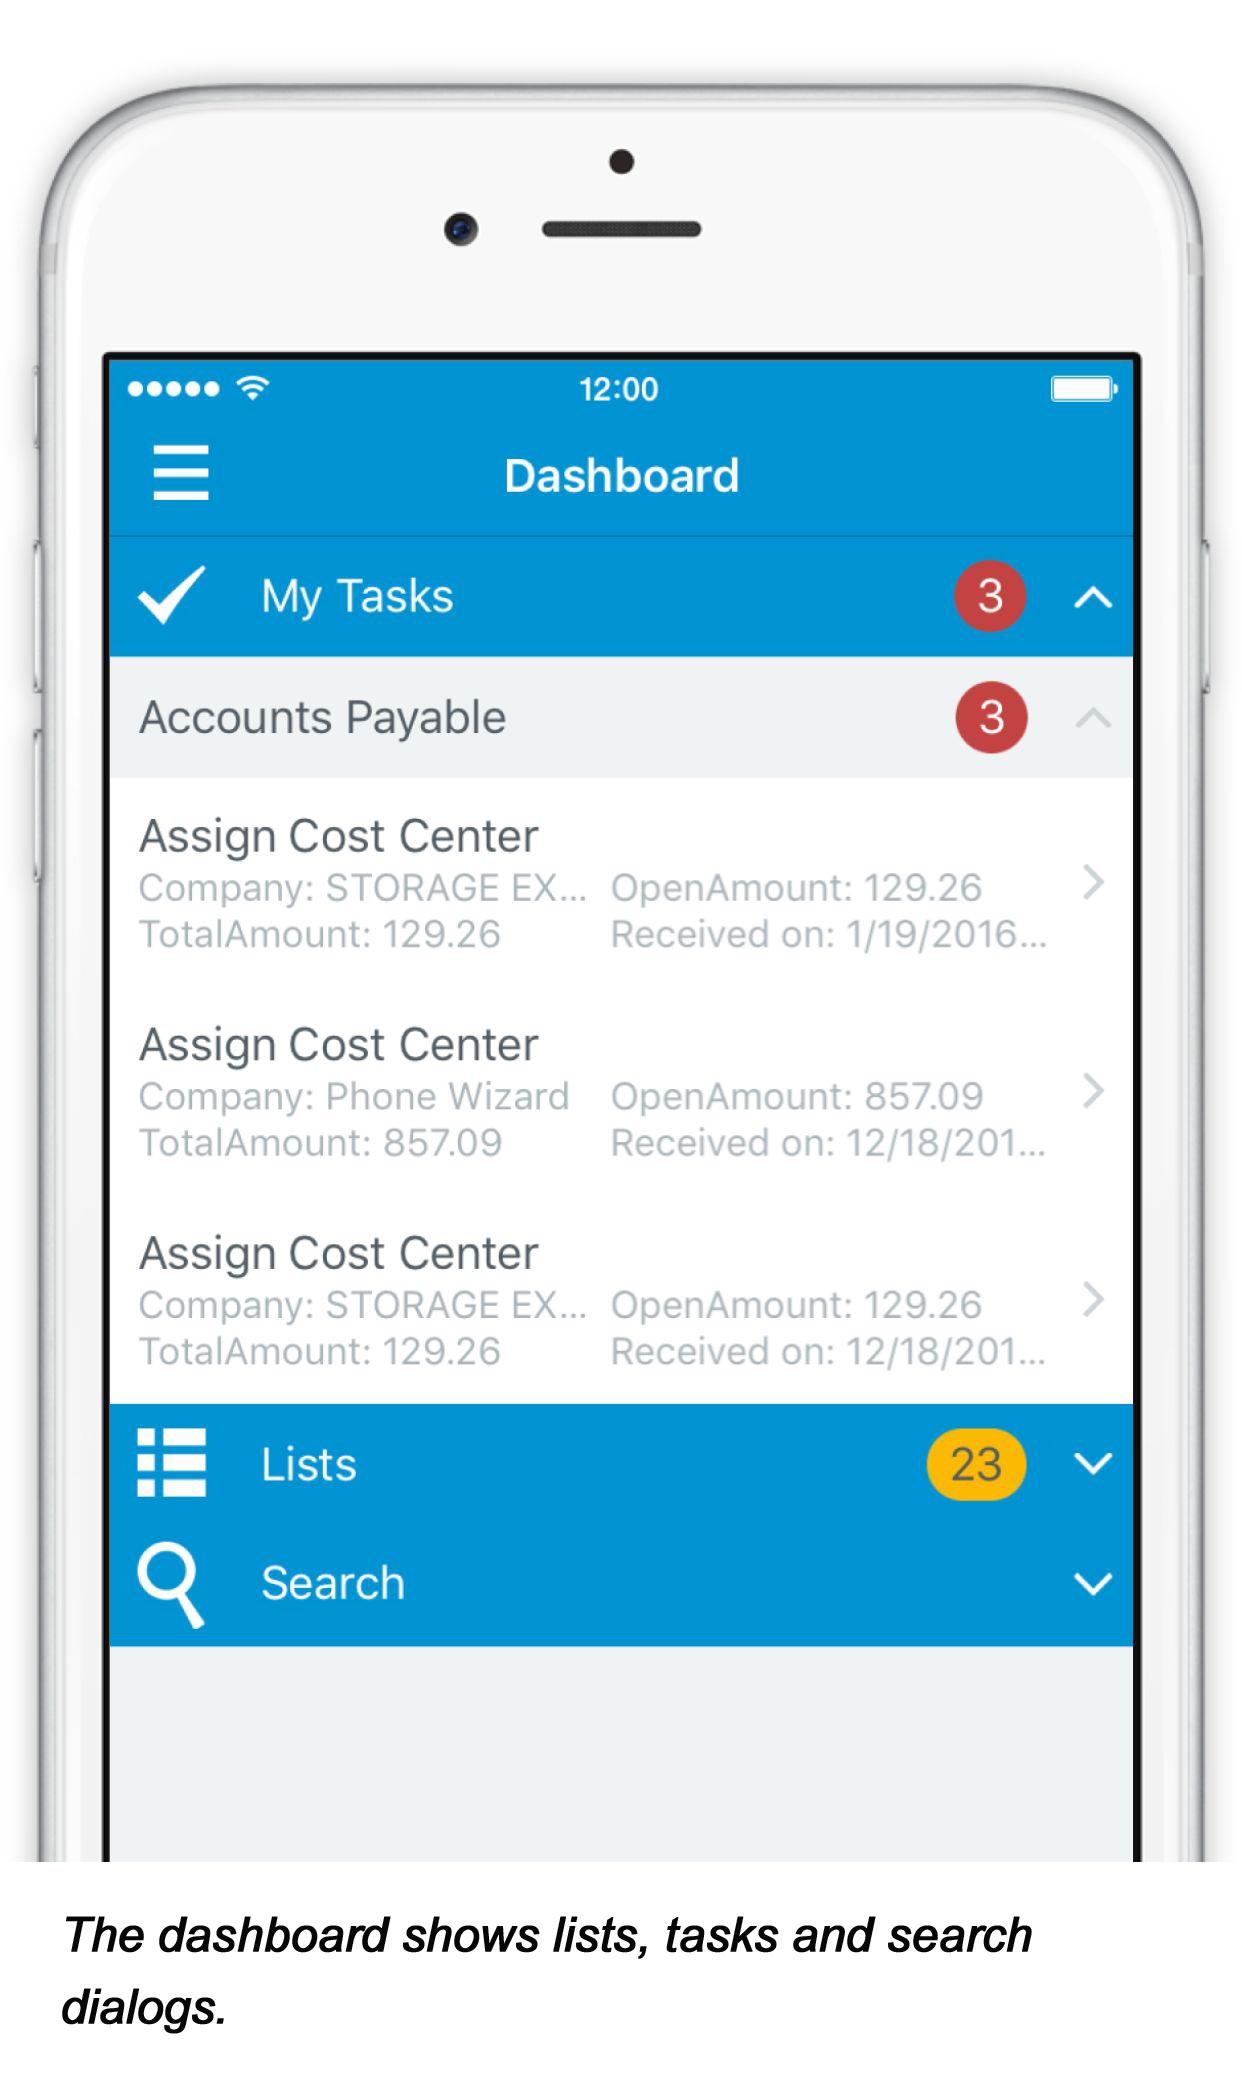 DocuWare_Mobile_Dashboard-1.jpg